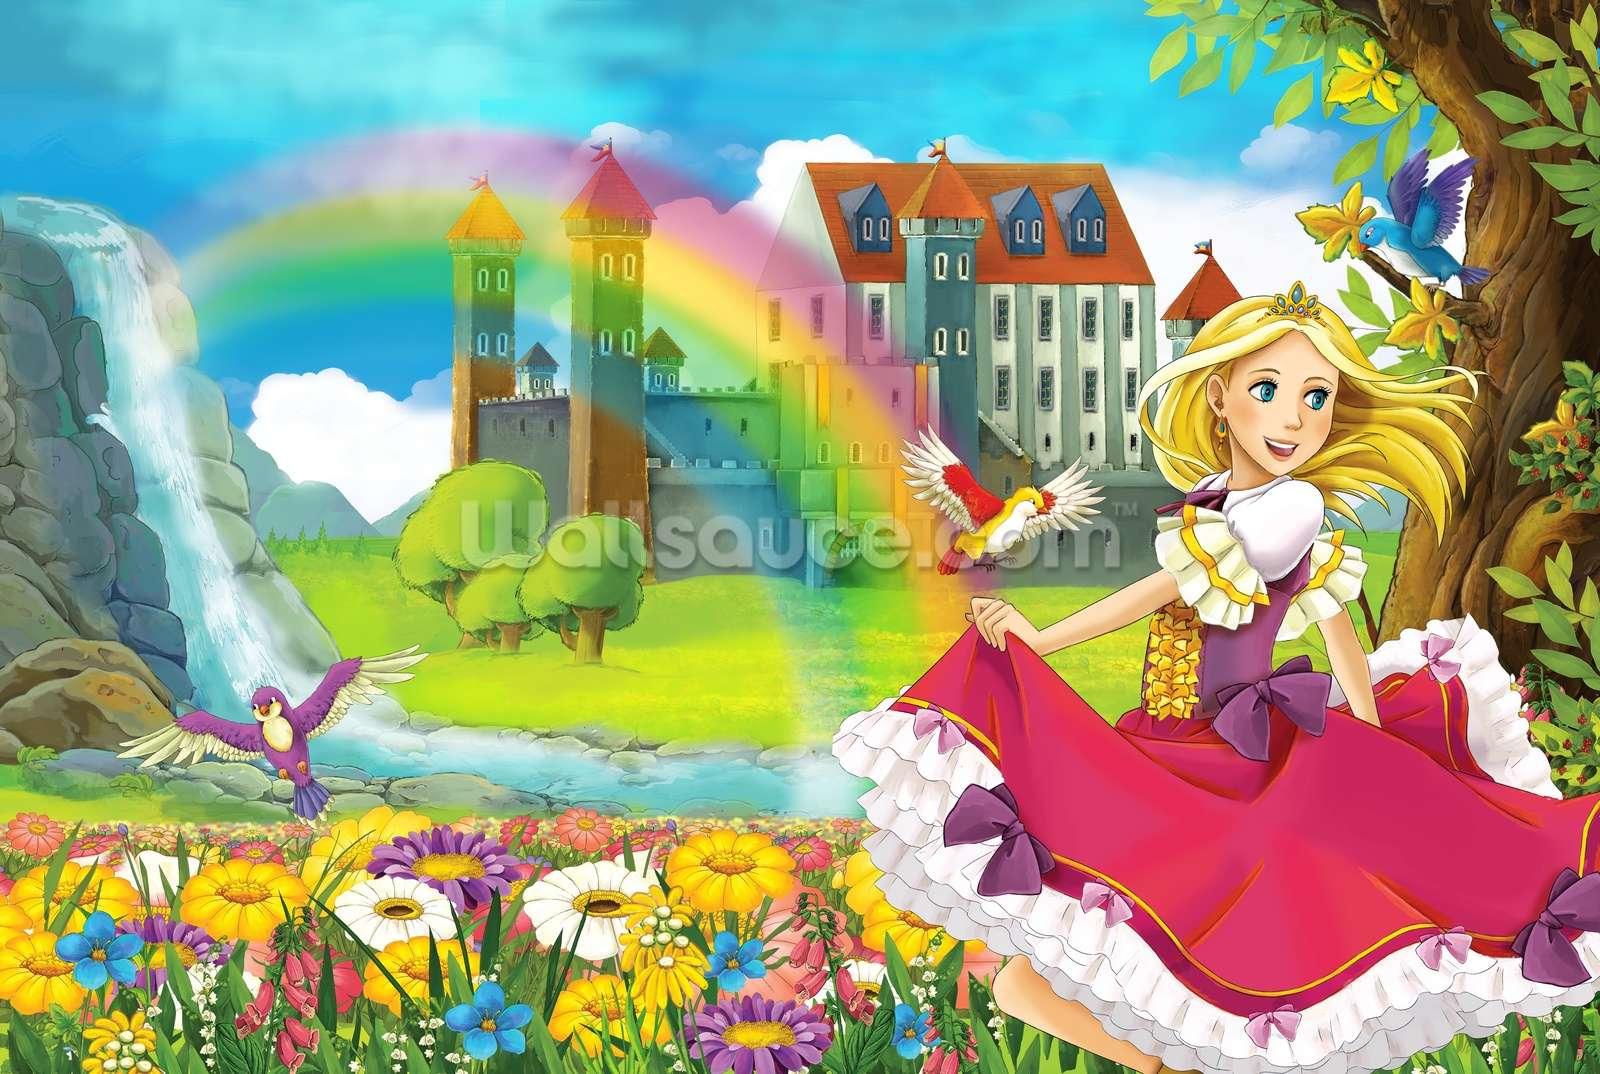 Beautiful princess wallpaper wall mural wallsauce usa for Beautiful wall mural